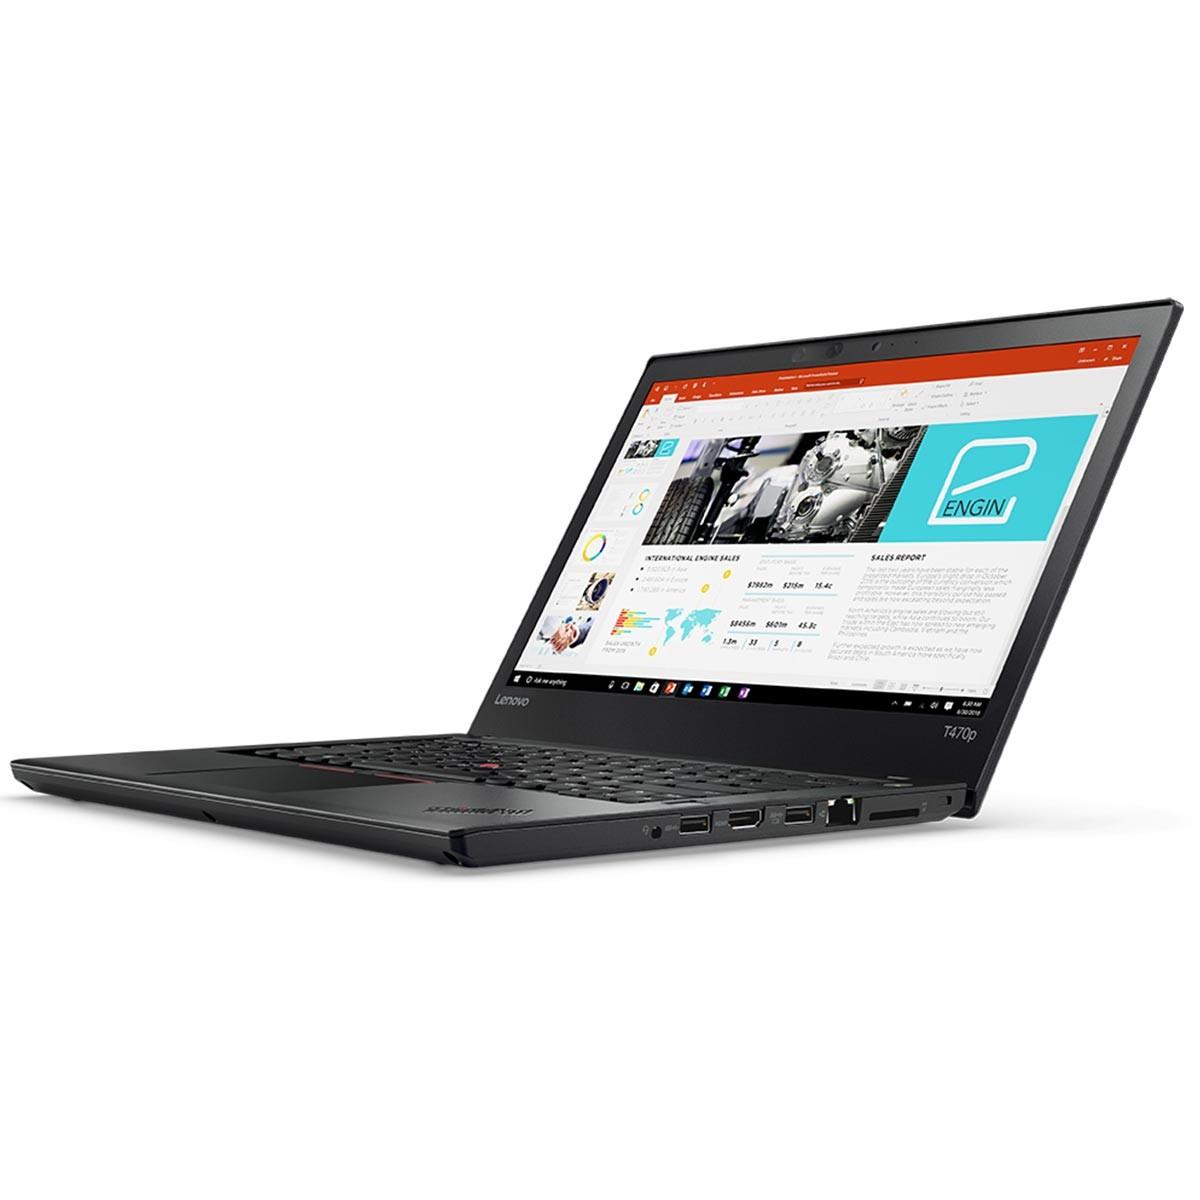 Lenovo™ ThinkPad® T470p Notebook-Konfigurator Modell 20J6-CTO